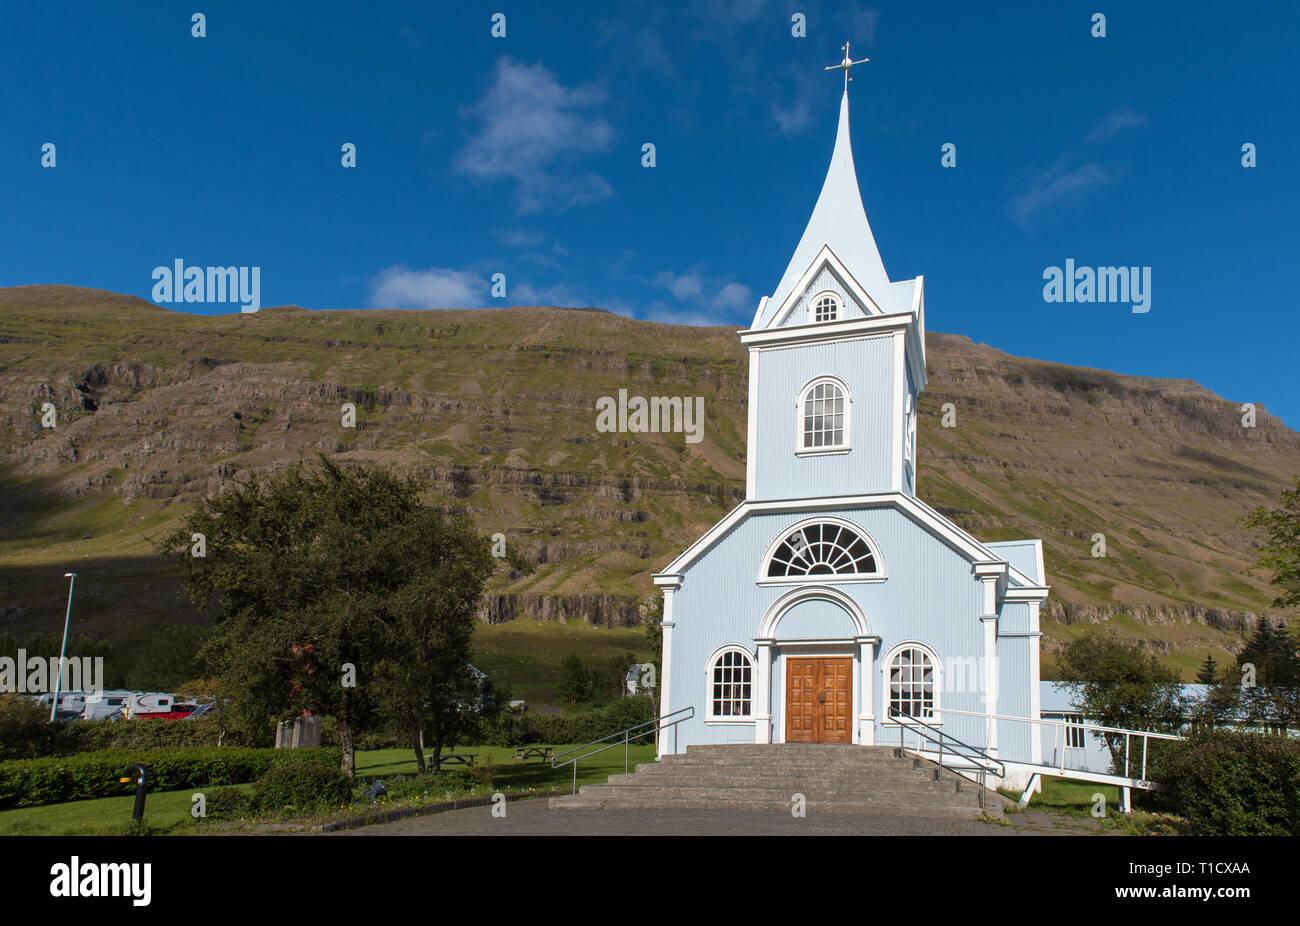 SEYDISFJORDUR, ICELAND, the blue church of Seydisfjordur, Iceland. - Stock Image